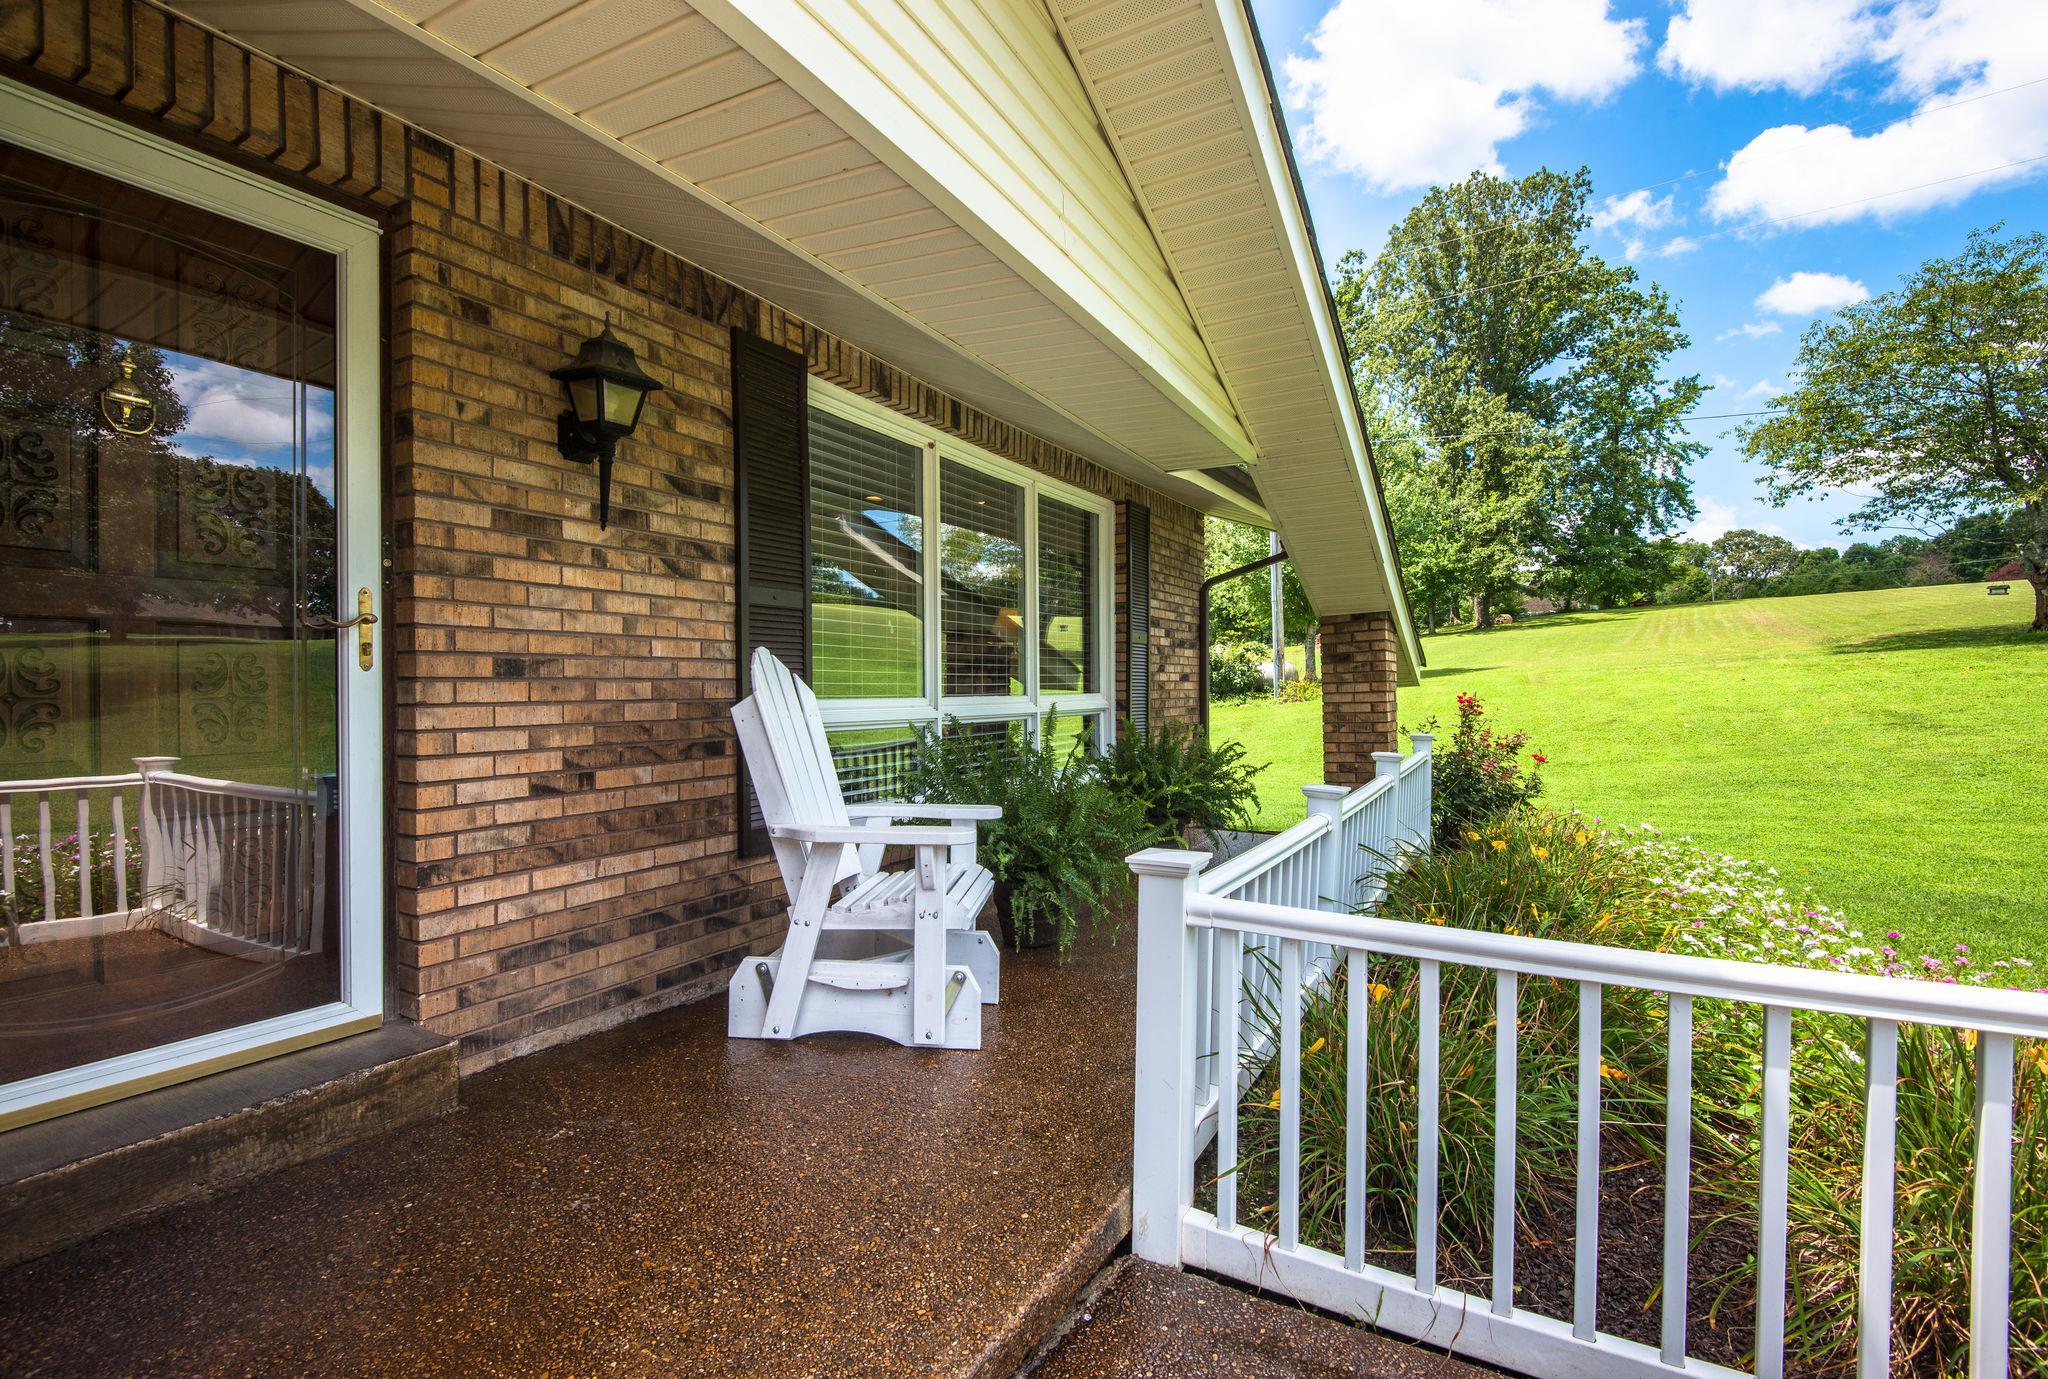 938 Belmont Rd, Clarksville, TN 37040 - Clarksville, TN real estate listing